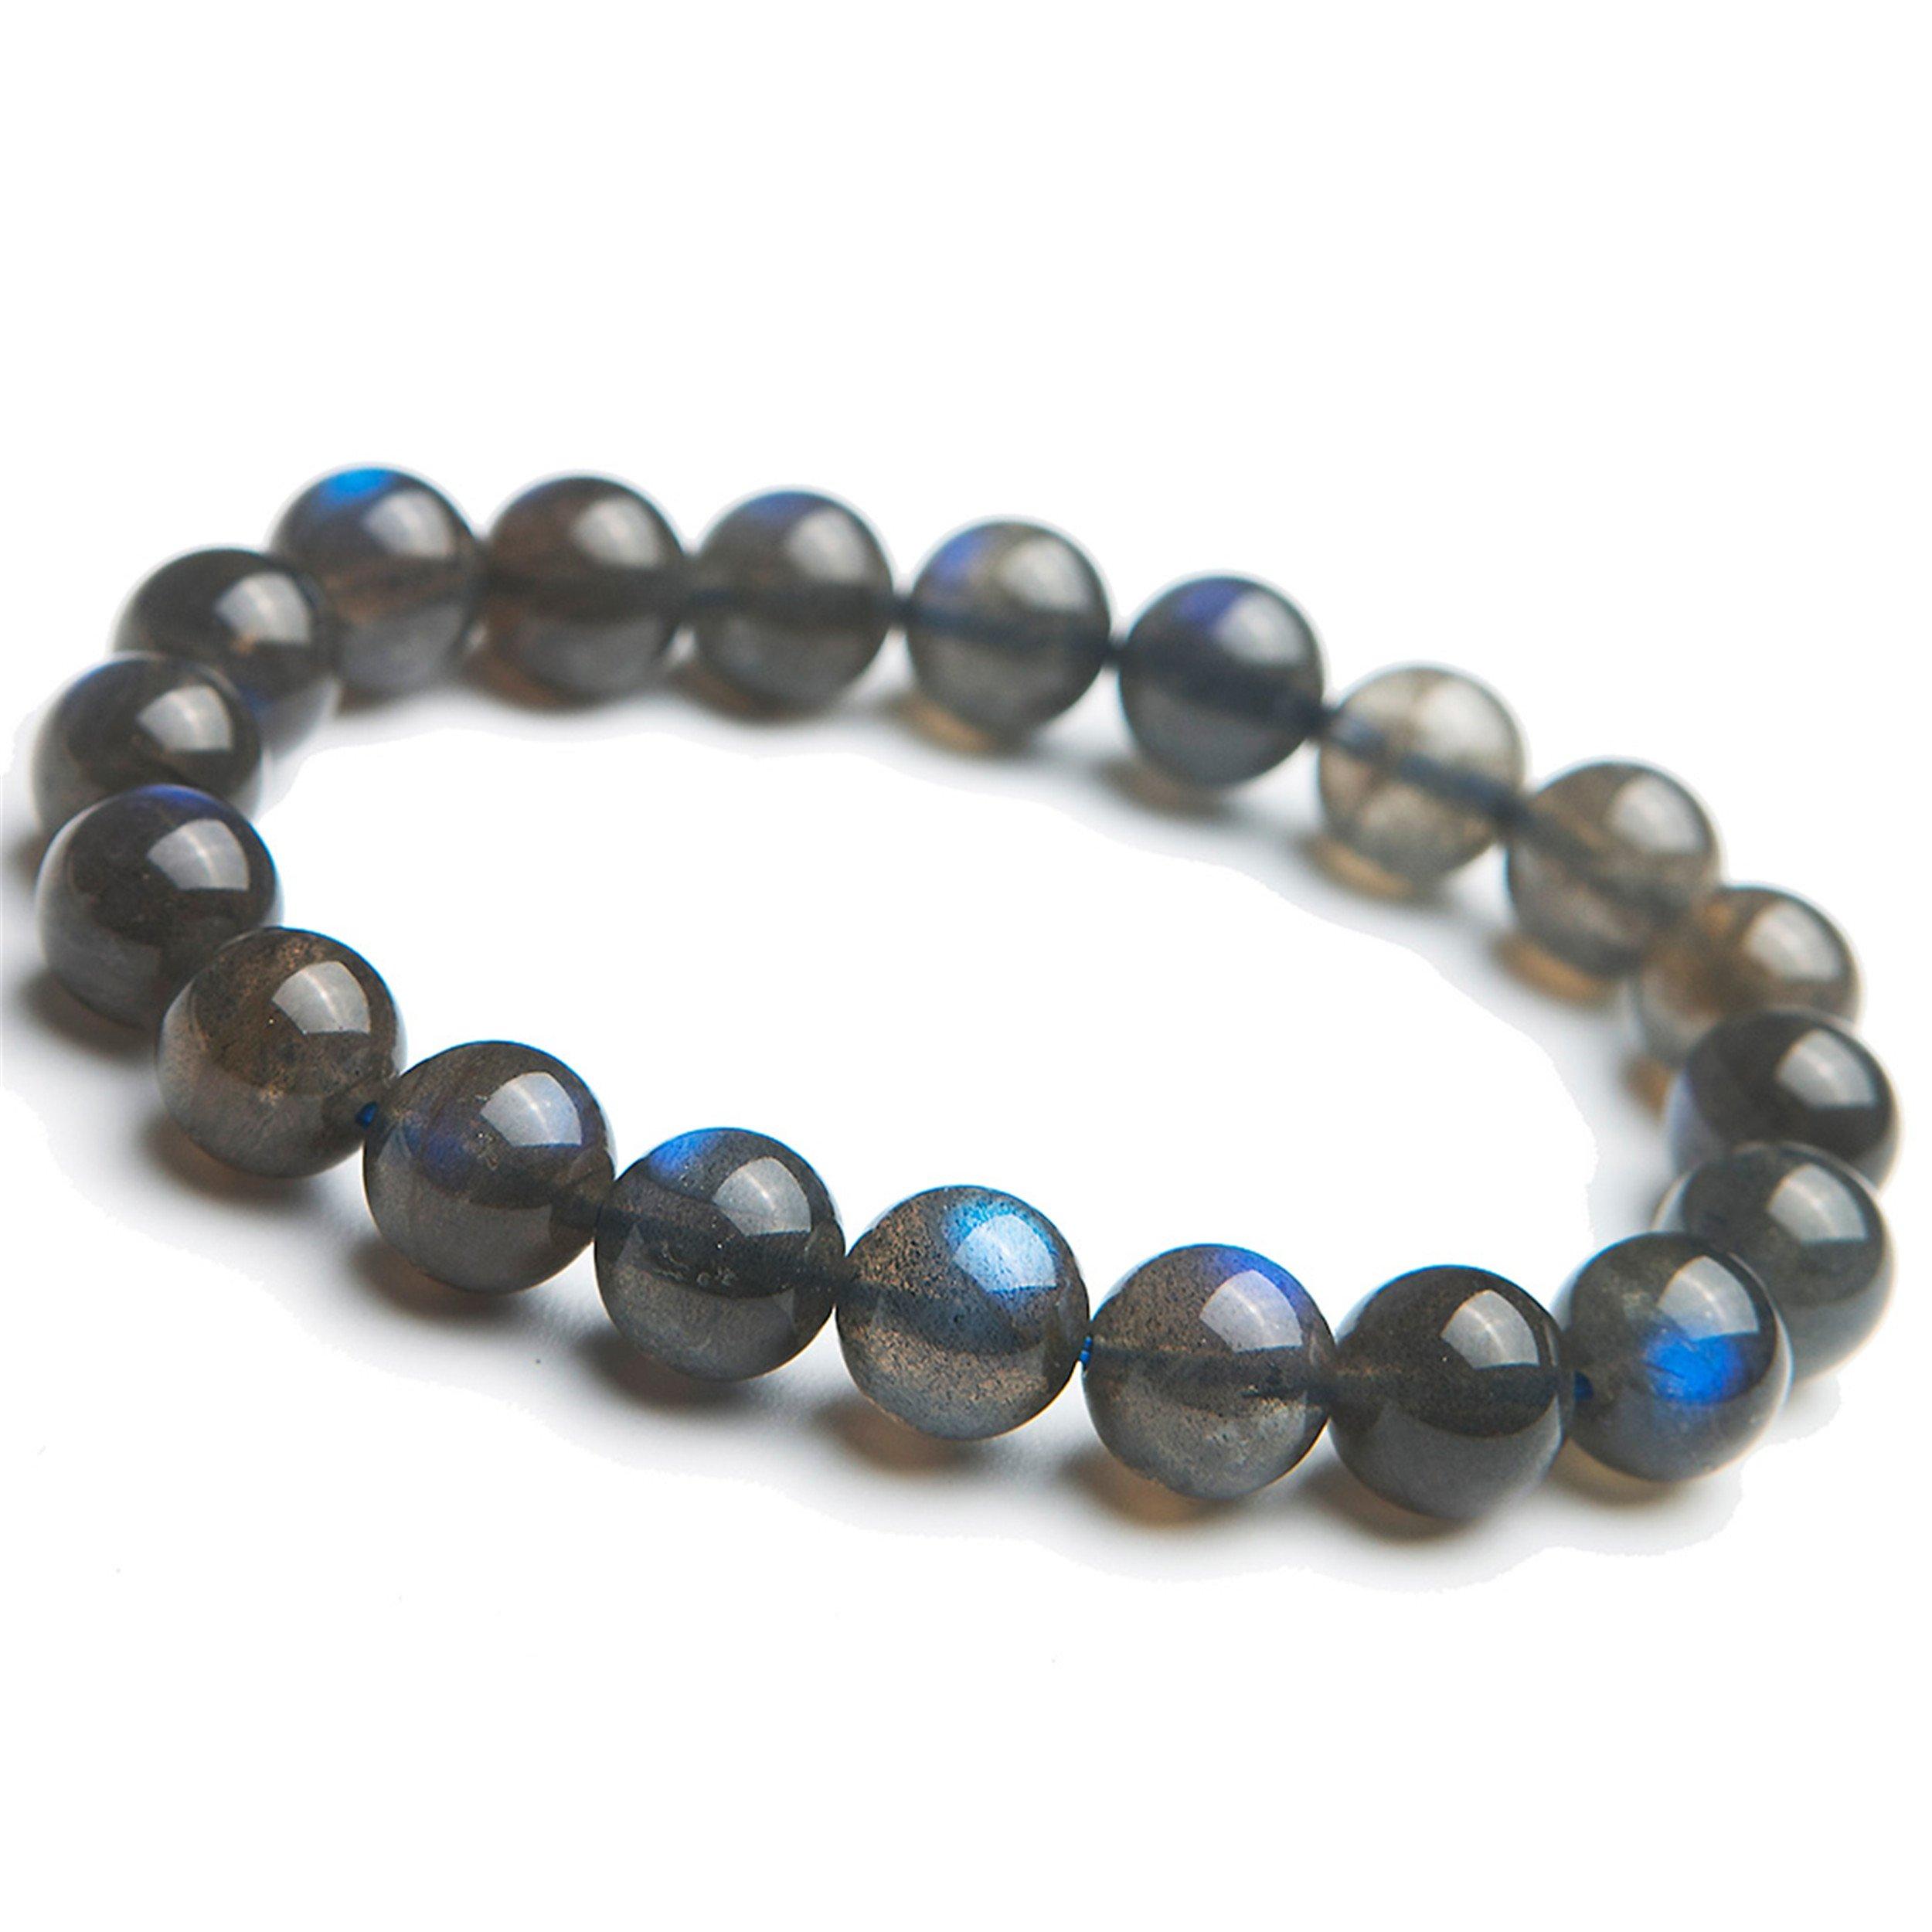 10mm Genuine Strong Blue Lights Natural Labradorite Gemstone Crystal Stretch Round Bead Bracelet